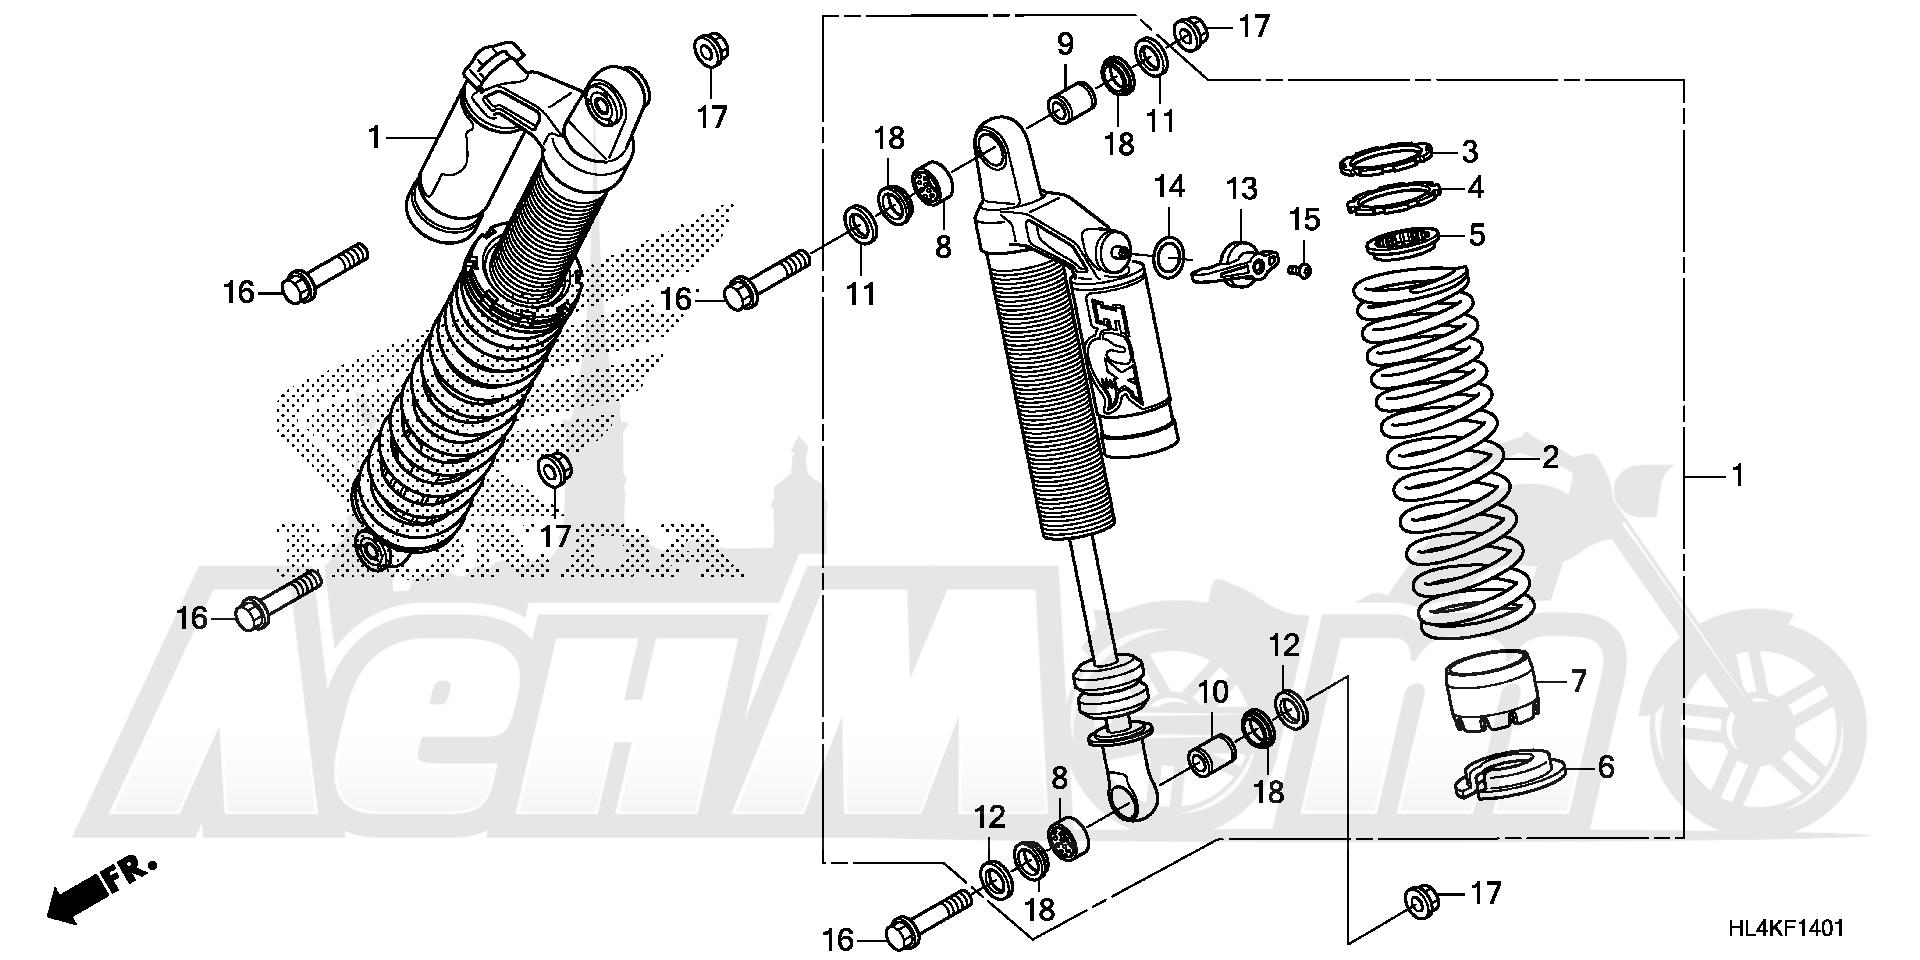 Запчасти для Квадроцикла Honda 2019 SXS1000M3L Раздел: FRONT CUSHION (2) | перед подкладка (2)